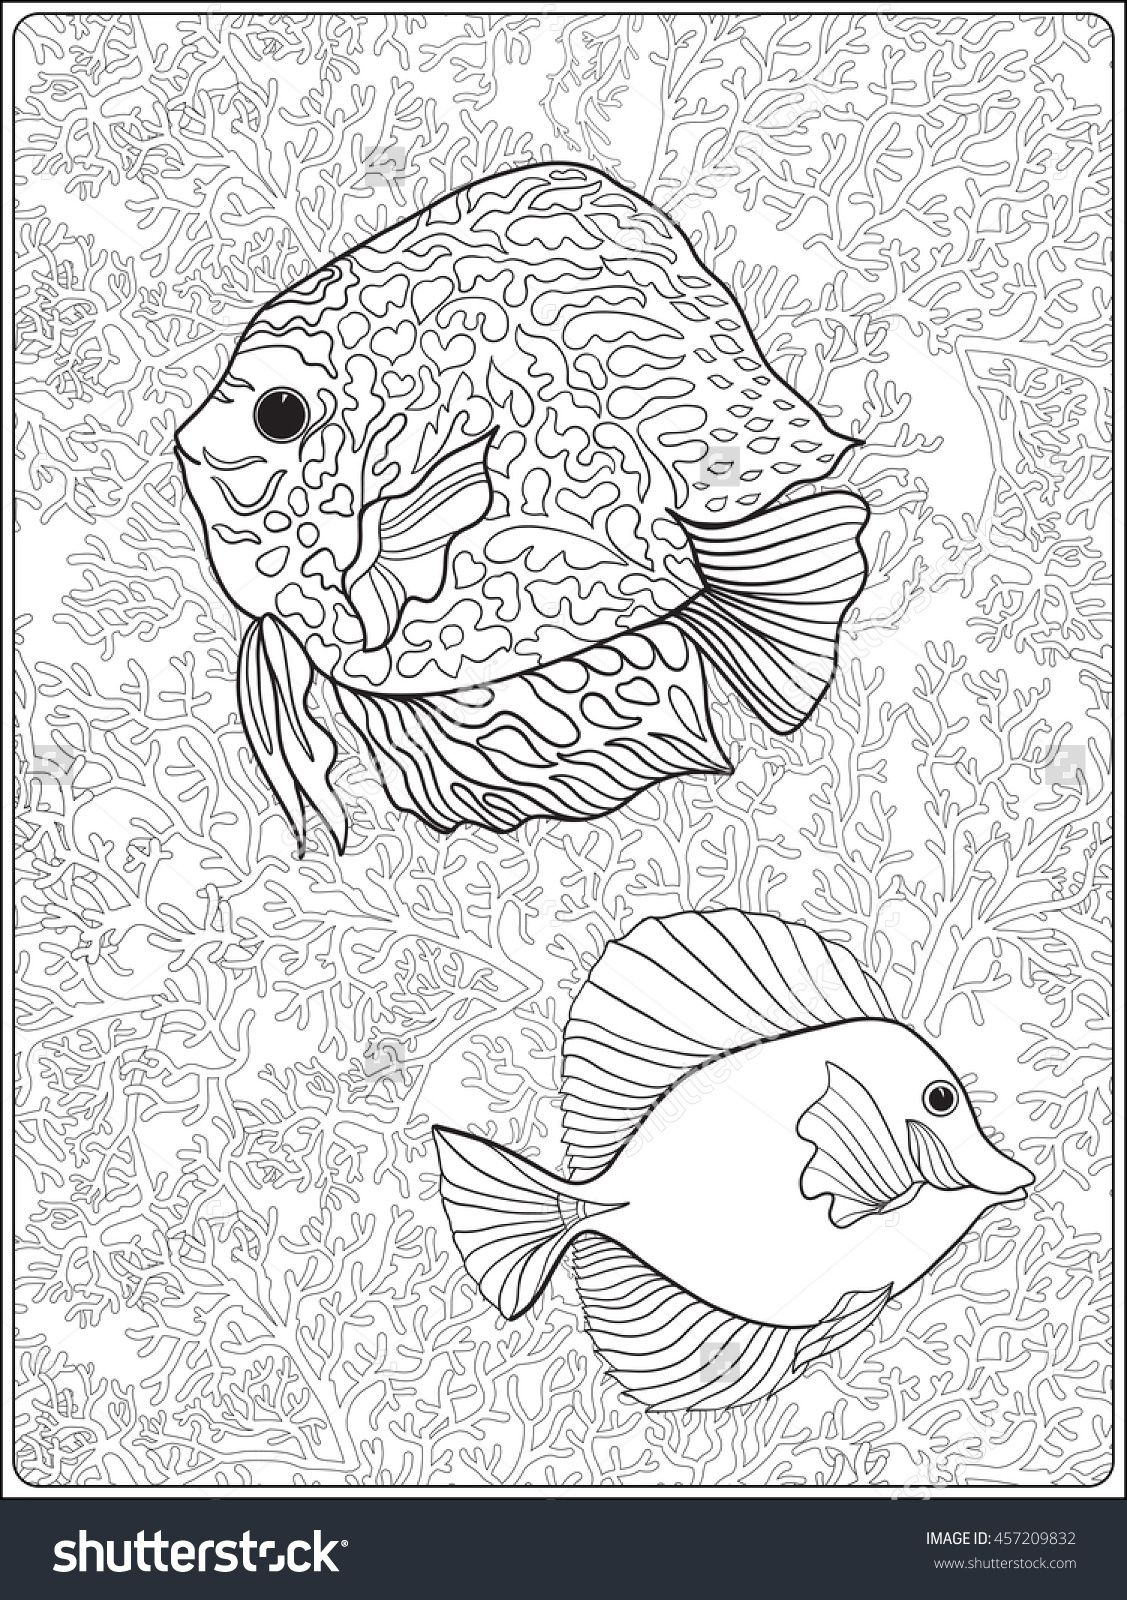 Pattern With Decorative Corals And Sea Or Aquarium Fish Vector